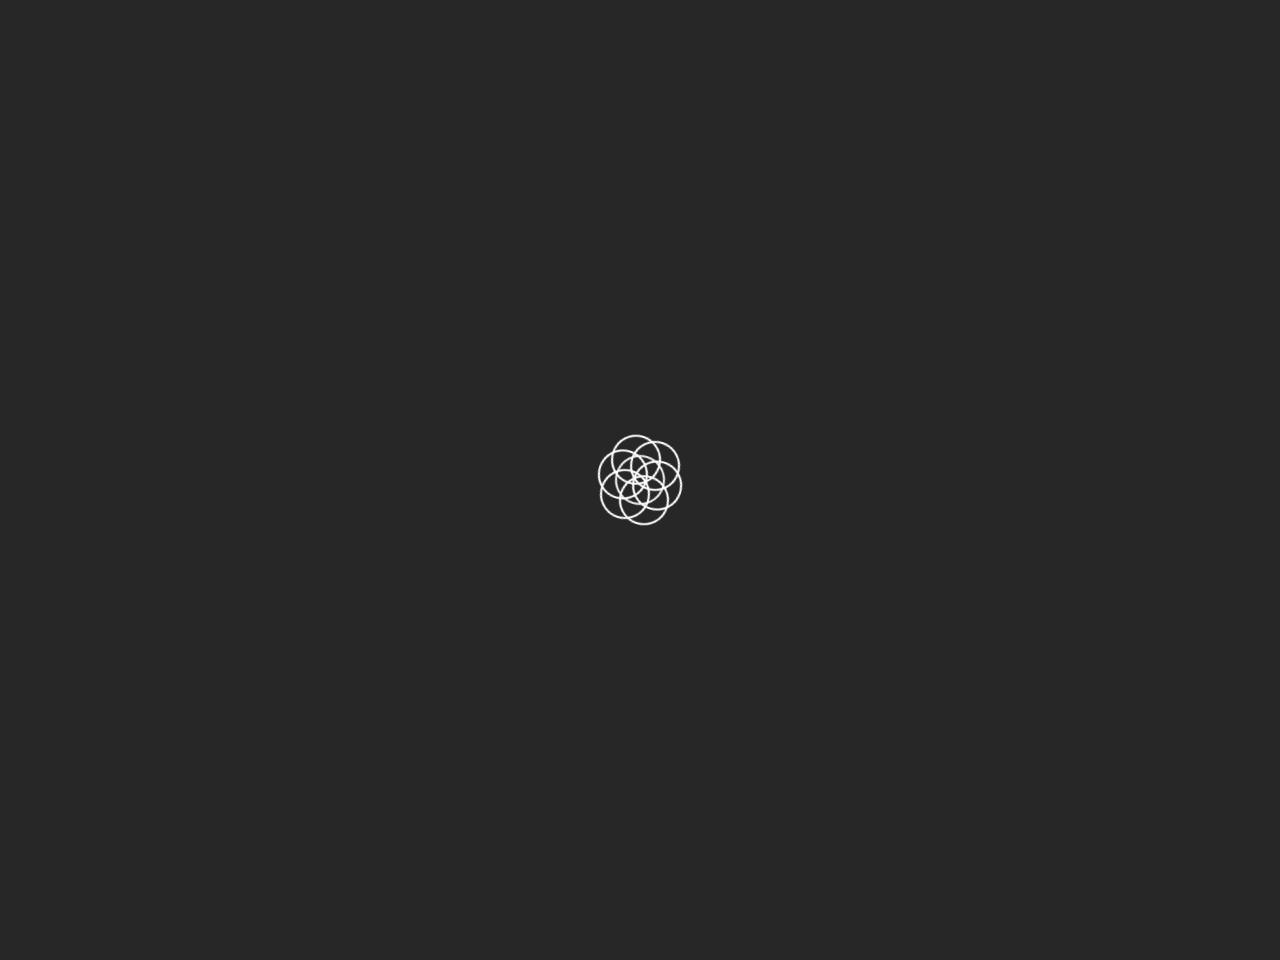 Digital Printing Letterhead Online Delhi India –Shivani Enterprises